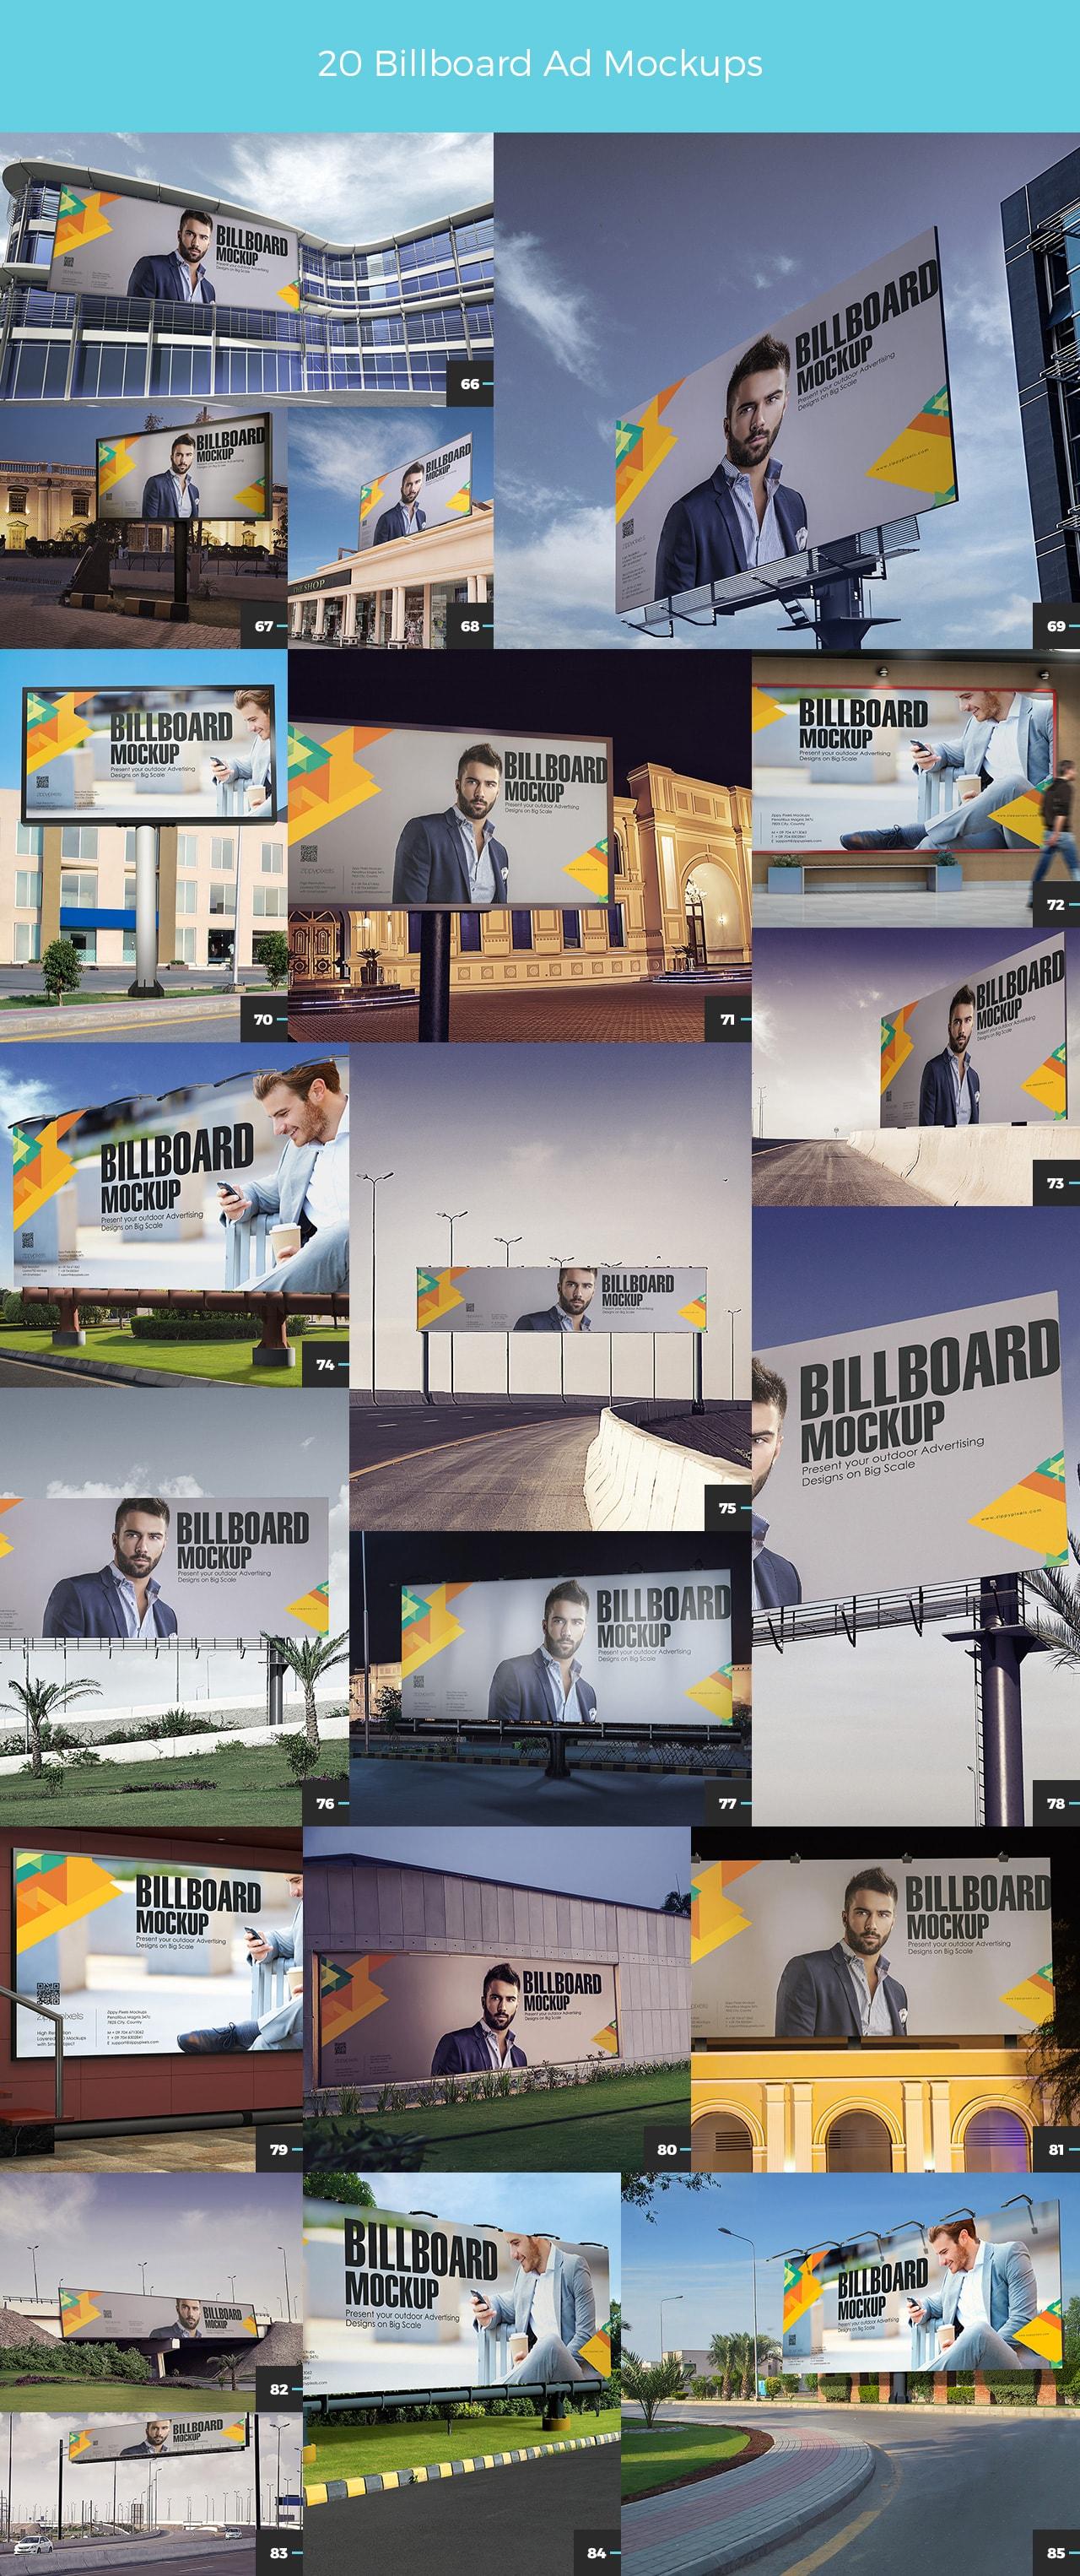 02 20 BILLBOARD AD MOCKUPS